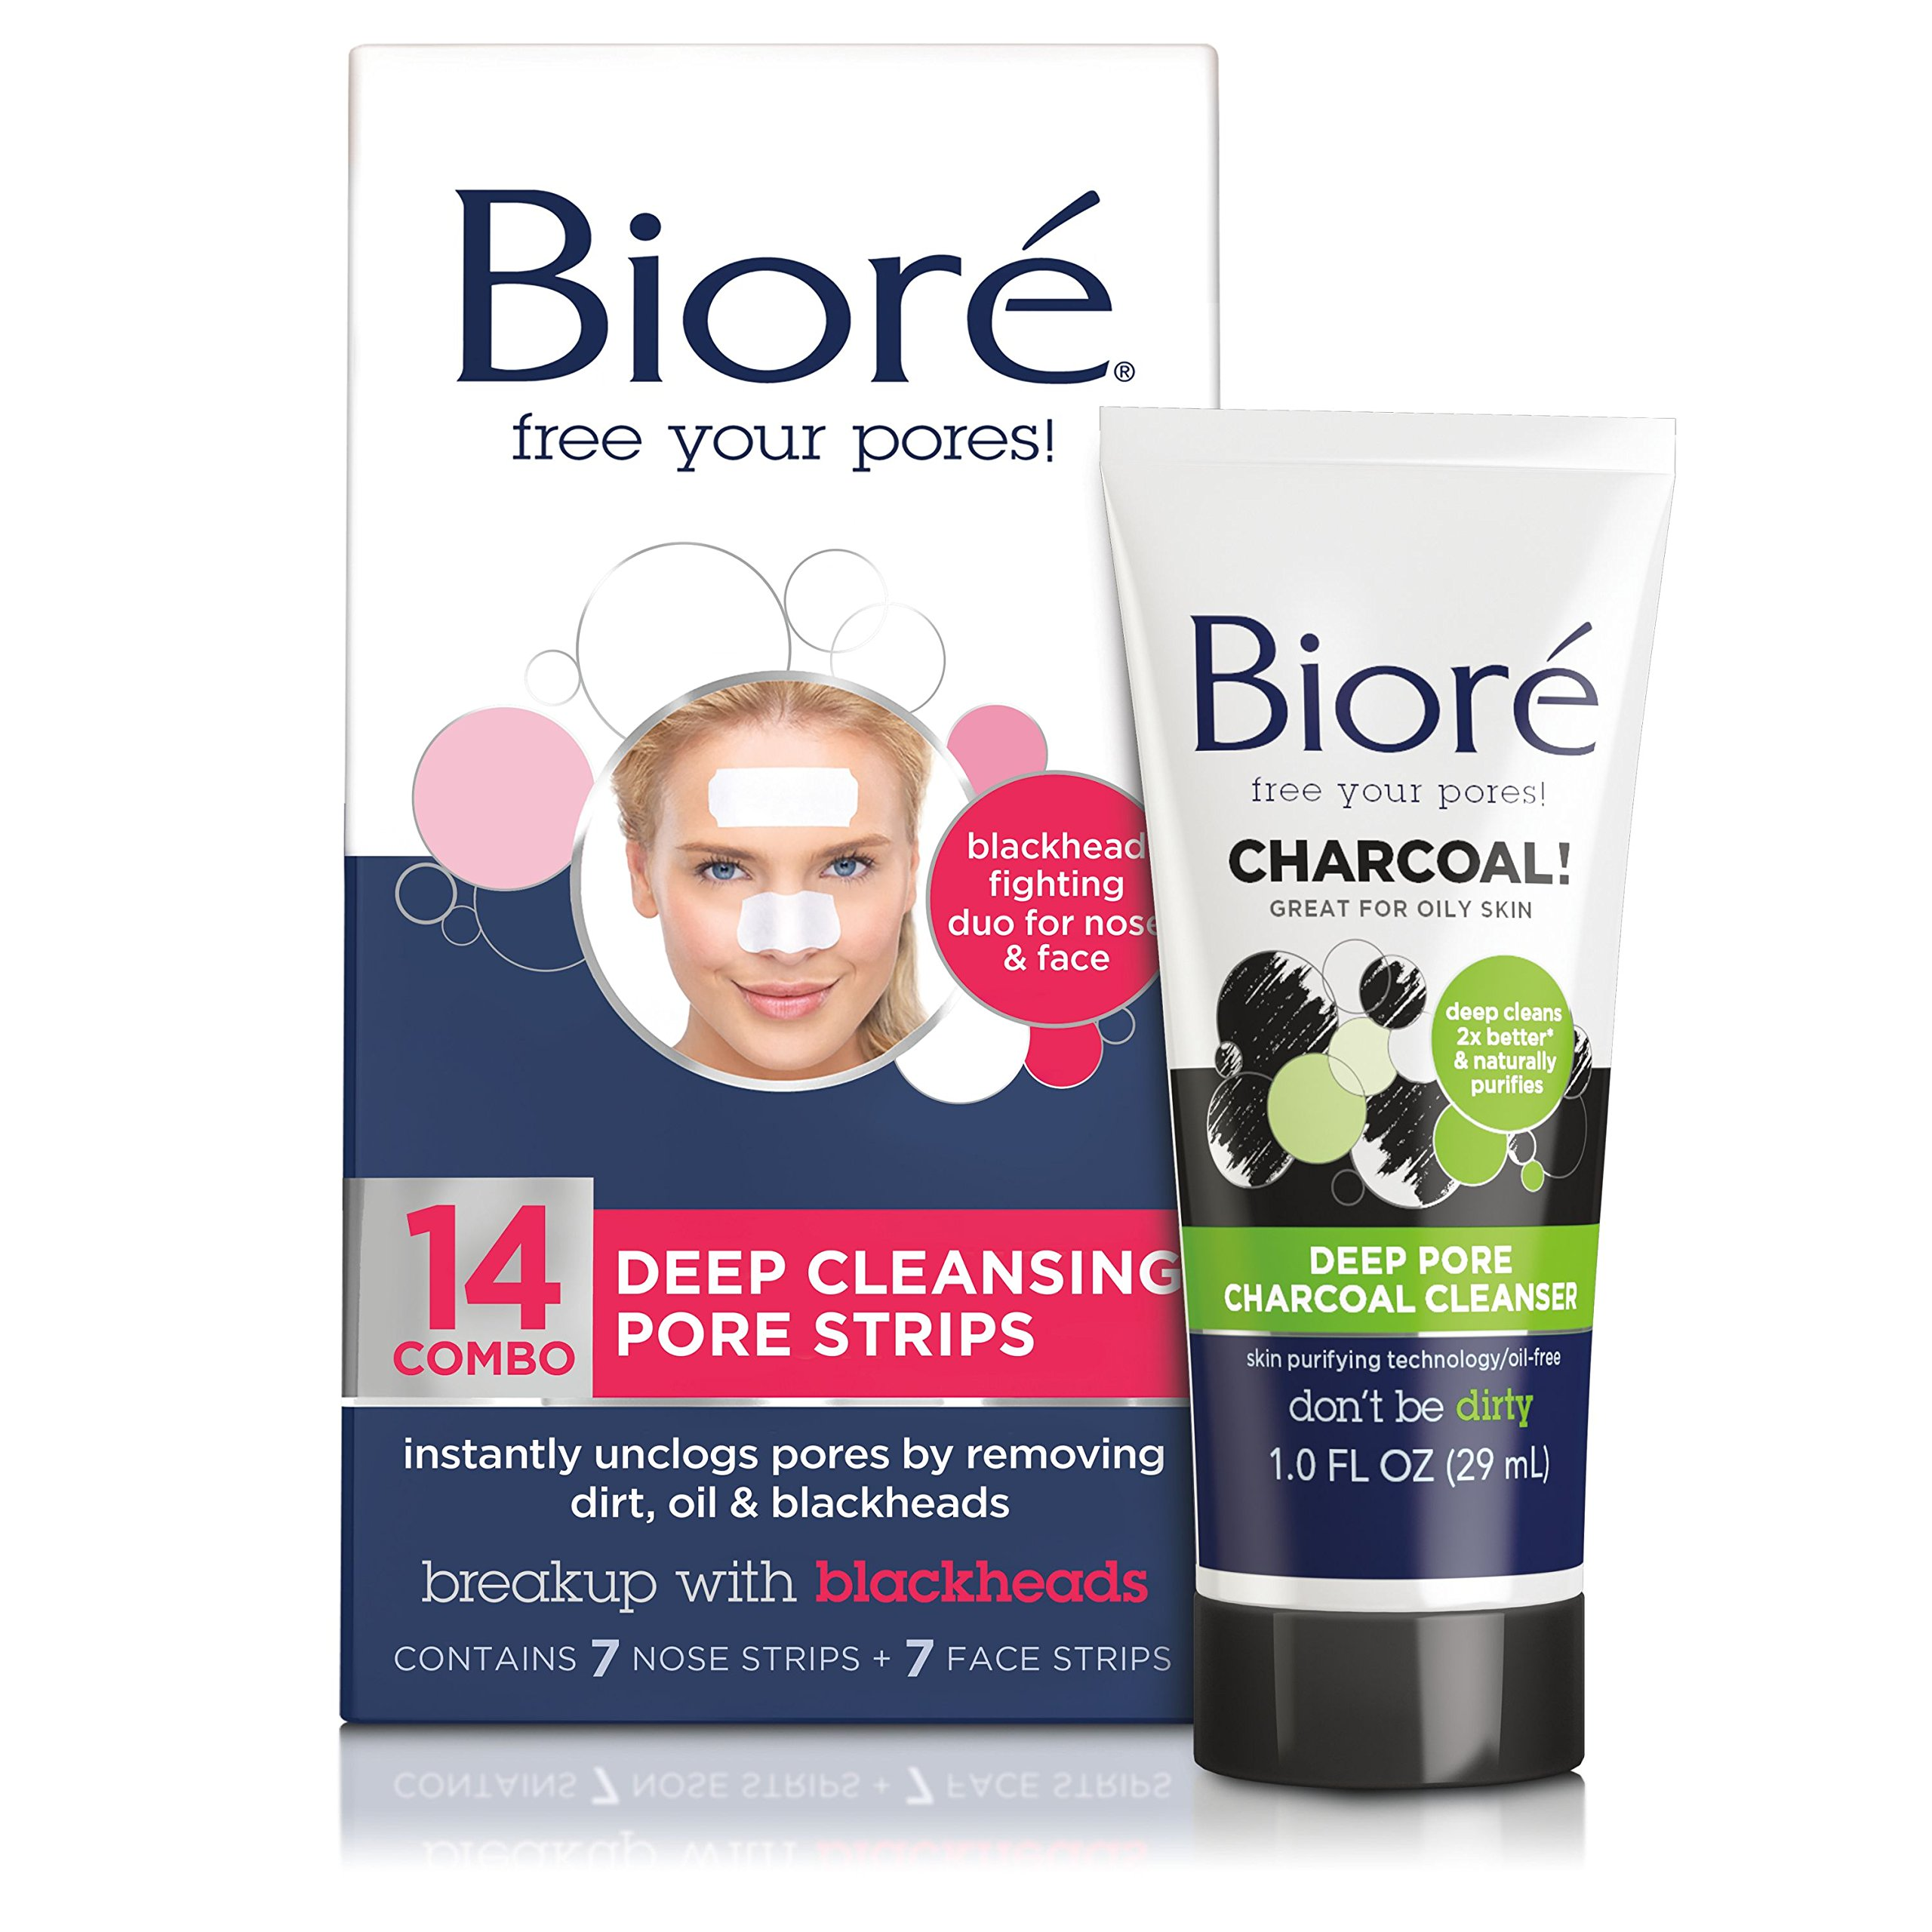 Bioré Deep Cleansing Pore Strips for Nose & Face (14 Count) + Mini Bioré Deep Pore Charcoal Cleanser for Oily Skin